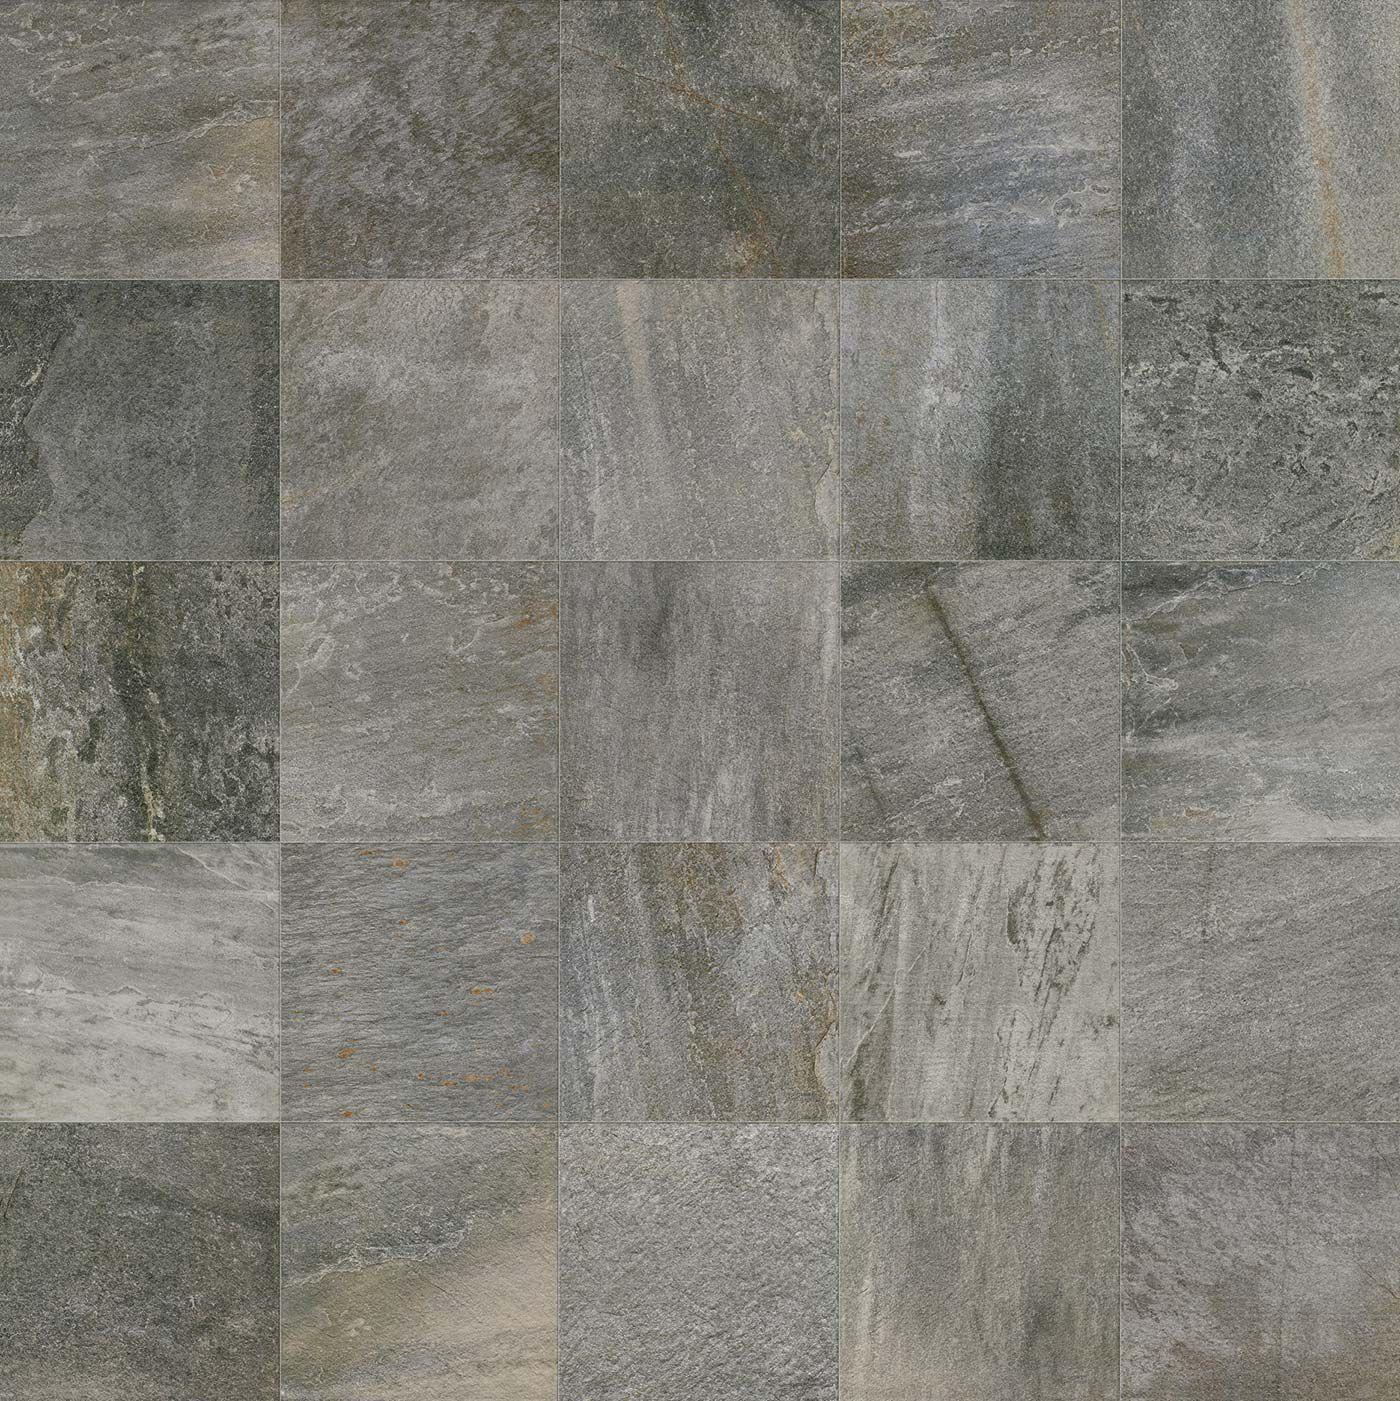 Indoor tile outdoor wall floor walks10 gray floor gres indoor tile outdoor wall floor walks10 gray floor gres dailygadgetfo Image collections